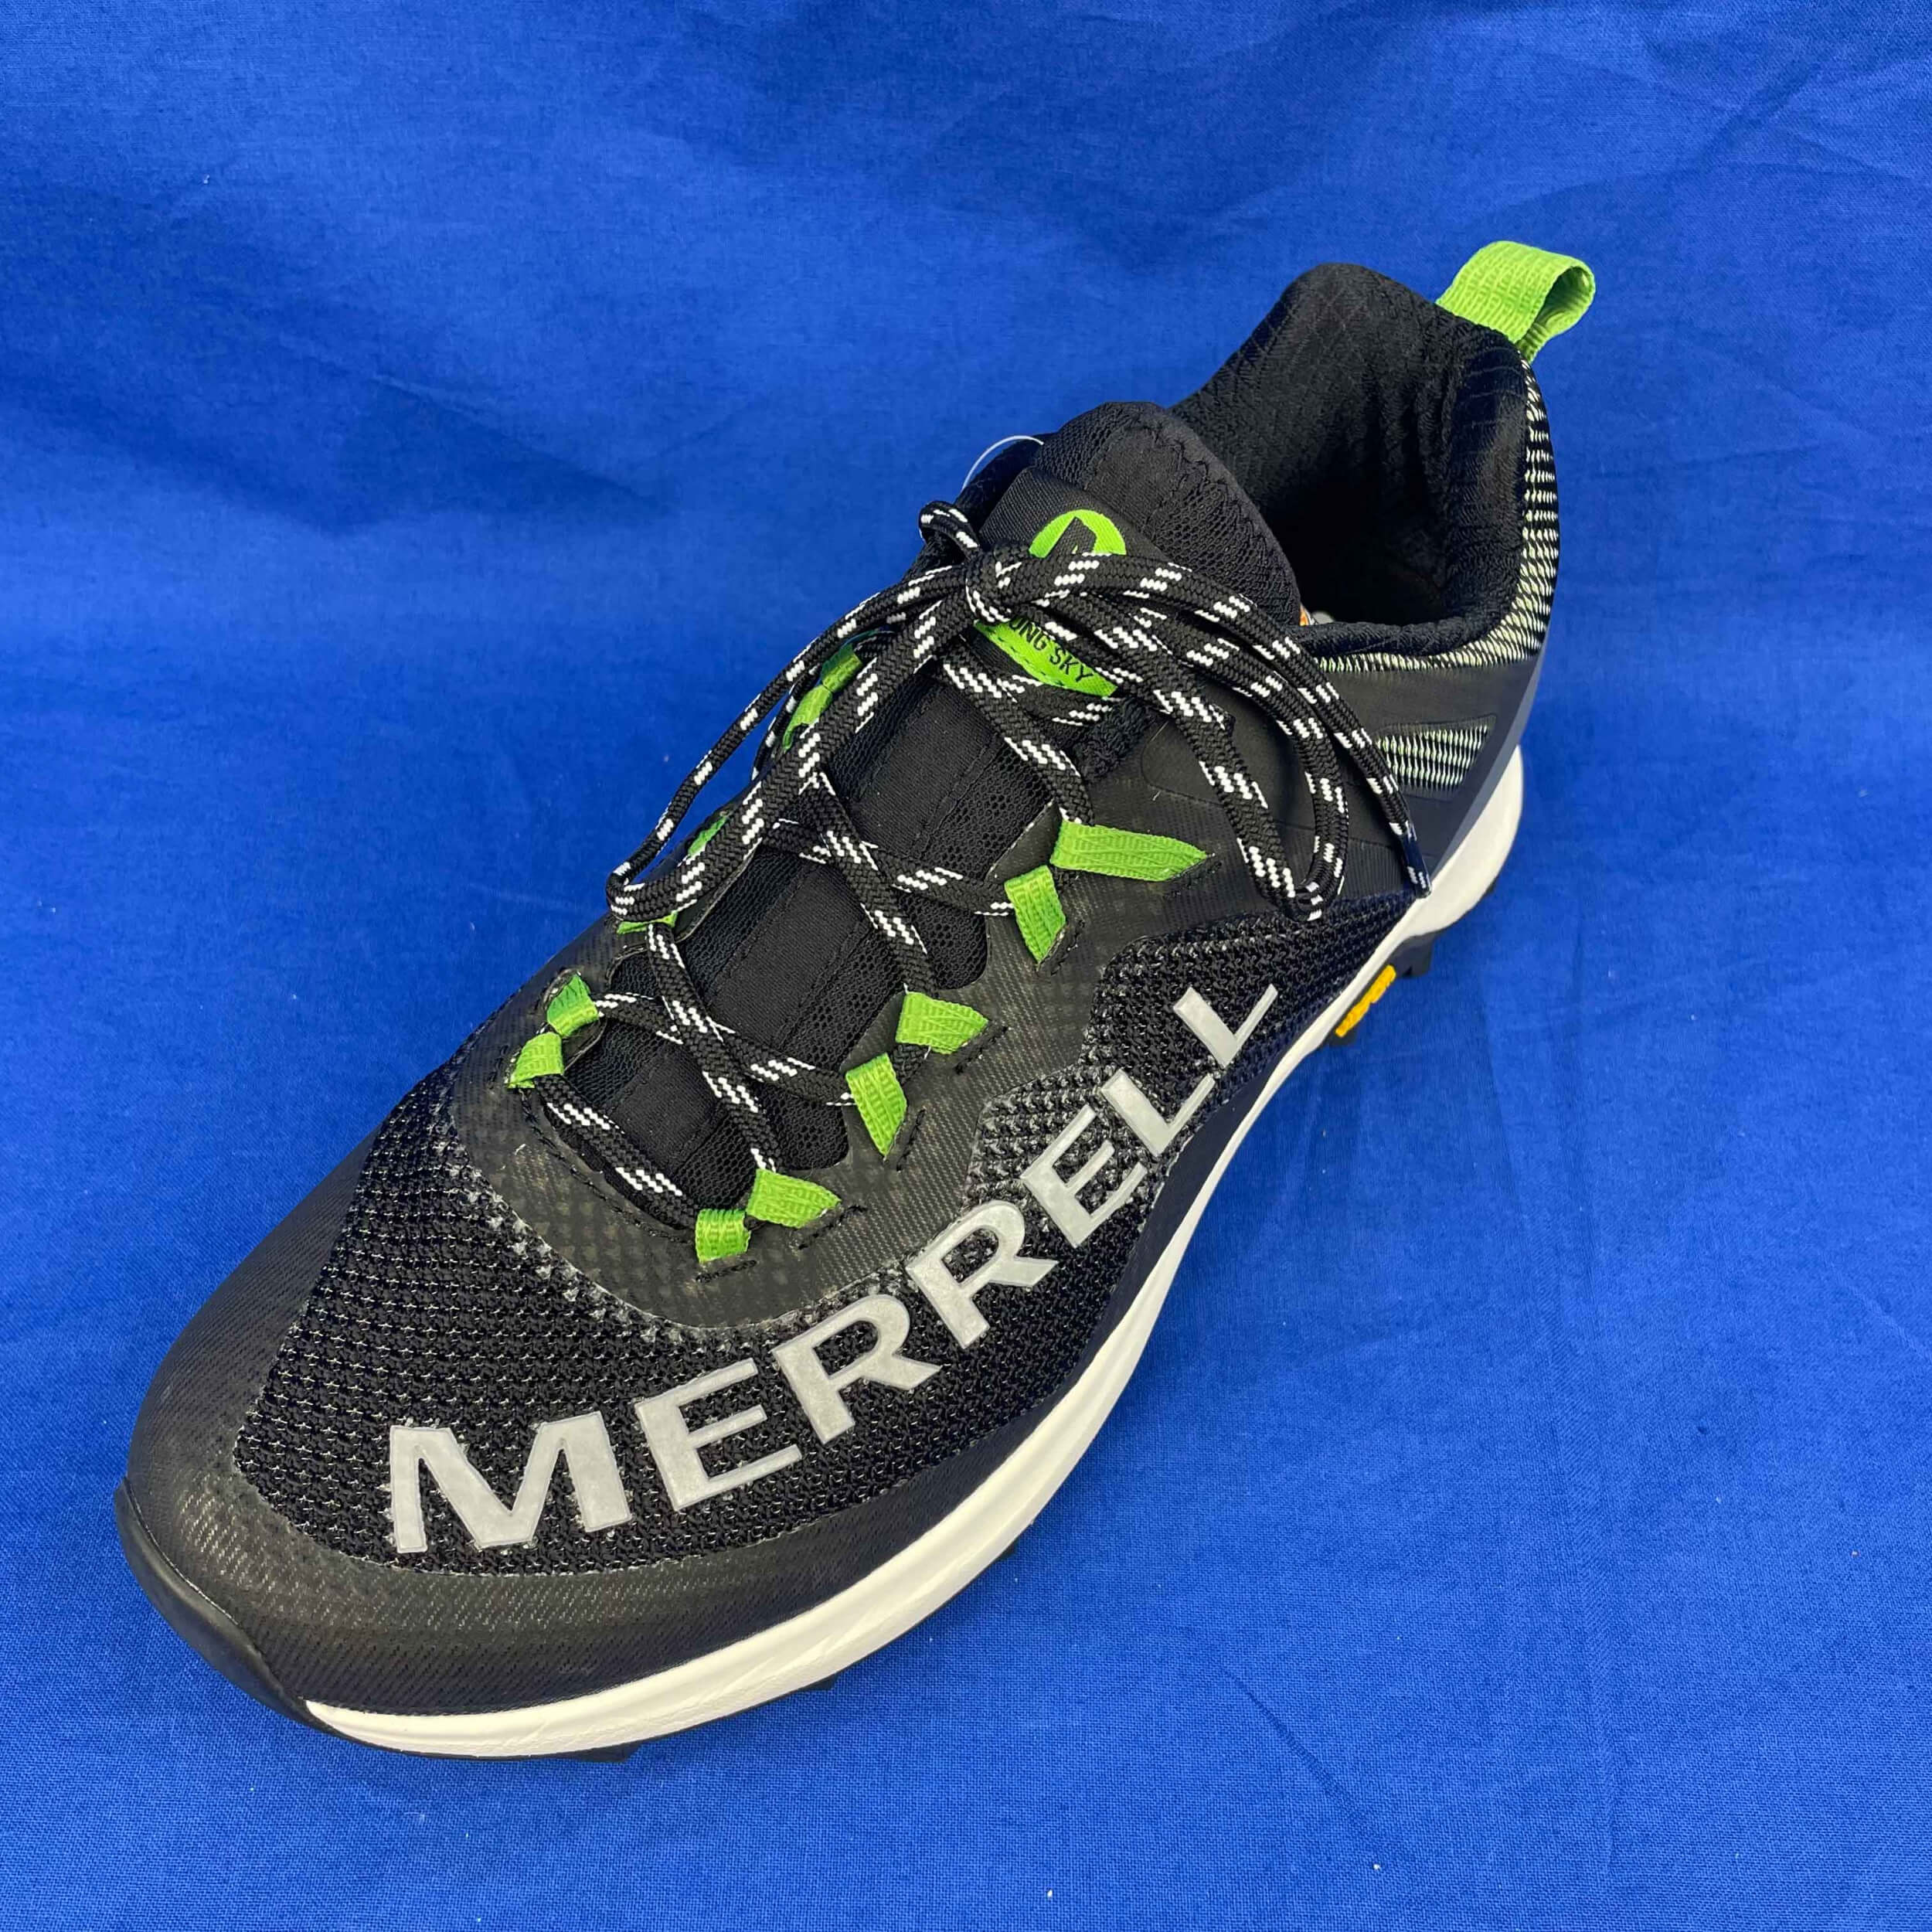 Merrell Herren Schuhe MTL Long Sky J066299 schwarz